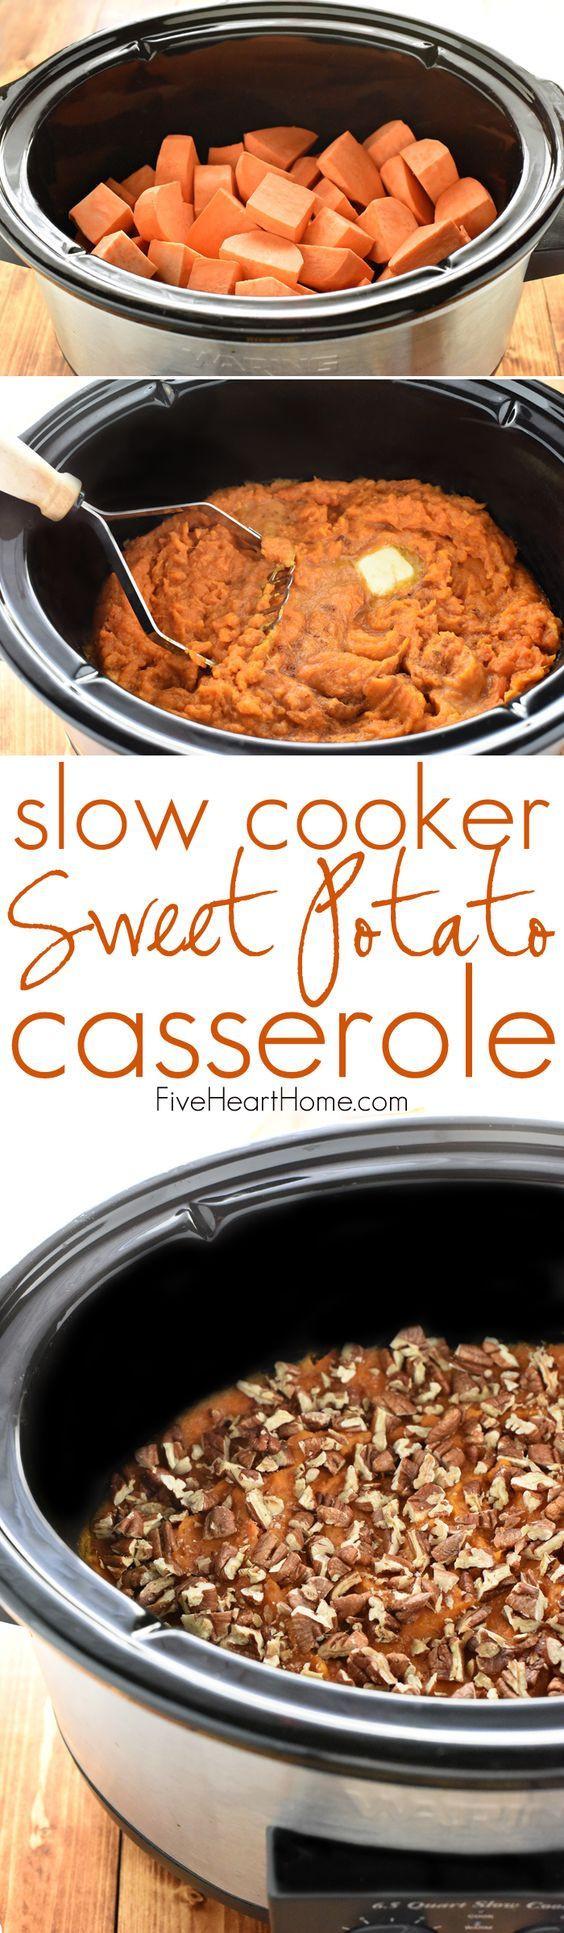 Crock Pot Thanksgiving Side Dishes  17 Best ideas about Thanksgiving Side Dishes on Pinterest